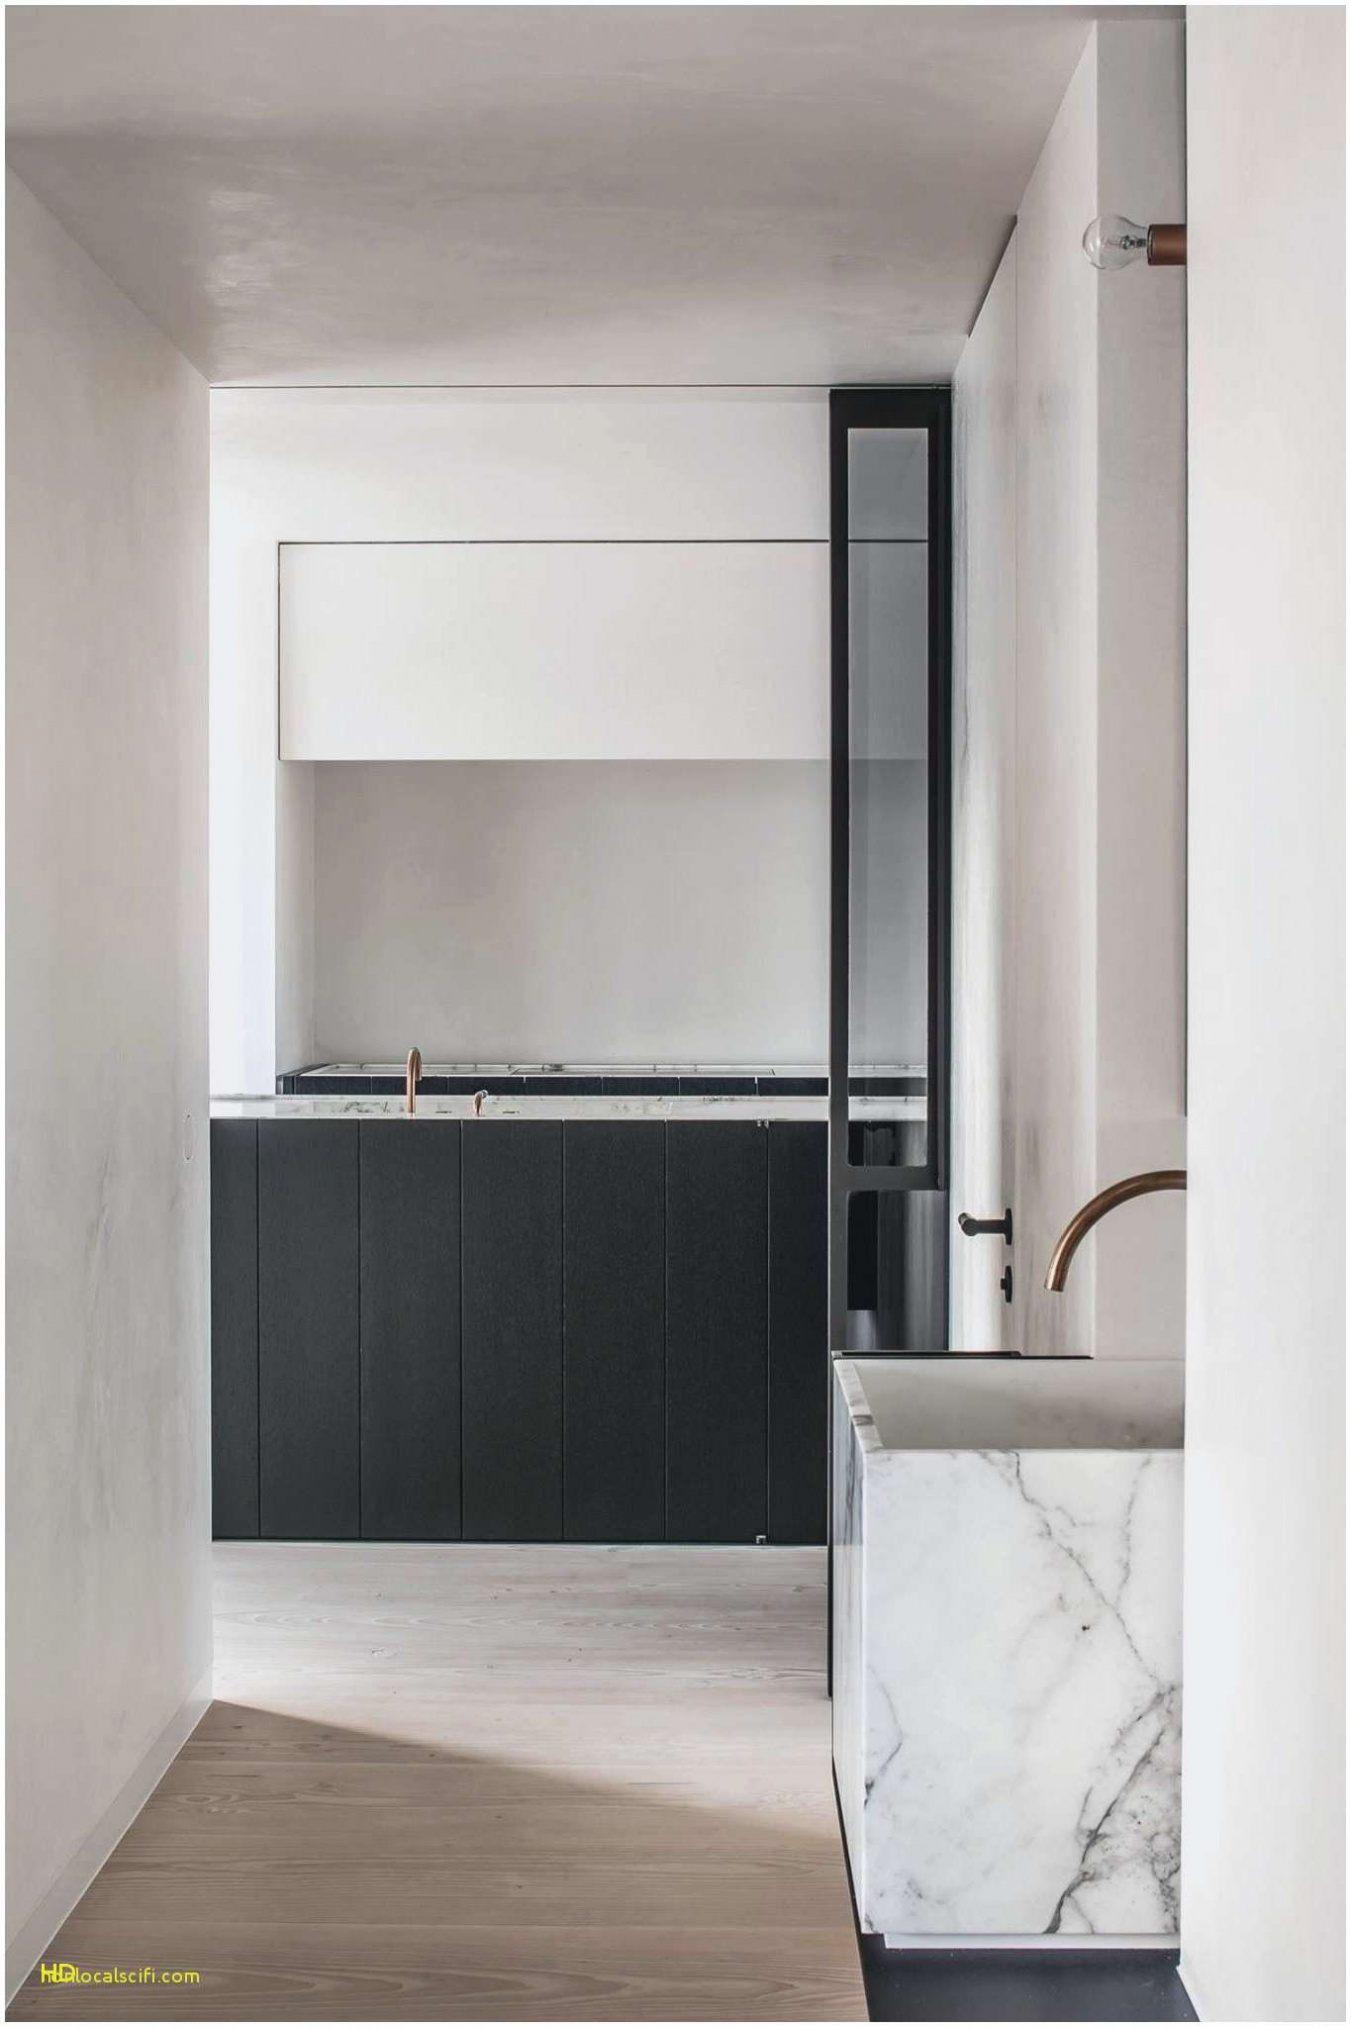 Lit Escamotable 2 Personnes Ikea Inspiré sove Grand Miroir Mural Rectangulaire — sovedis Aquatabs